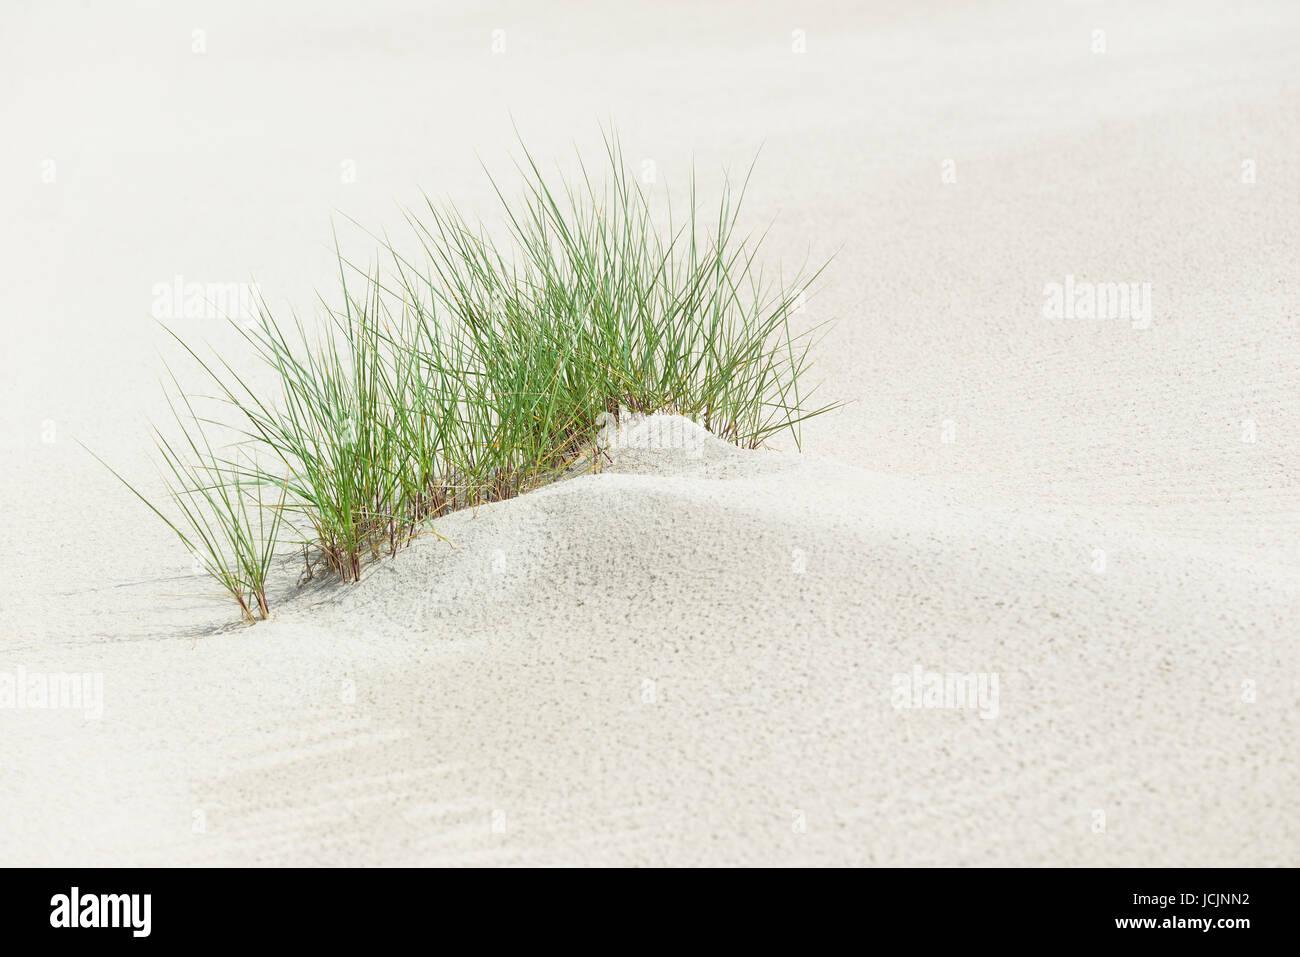 European Marram Gras (Ammophila arenaria) in fine sand, Norderney, East Frisian Islands, Lower Saxony, Germany - Stock Image